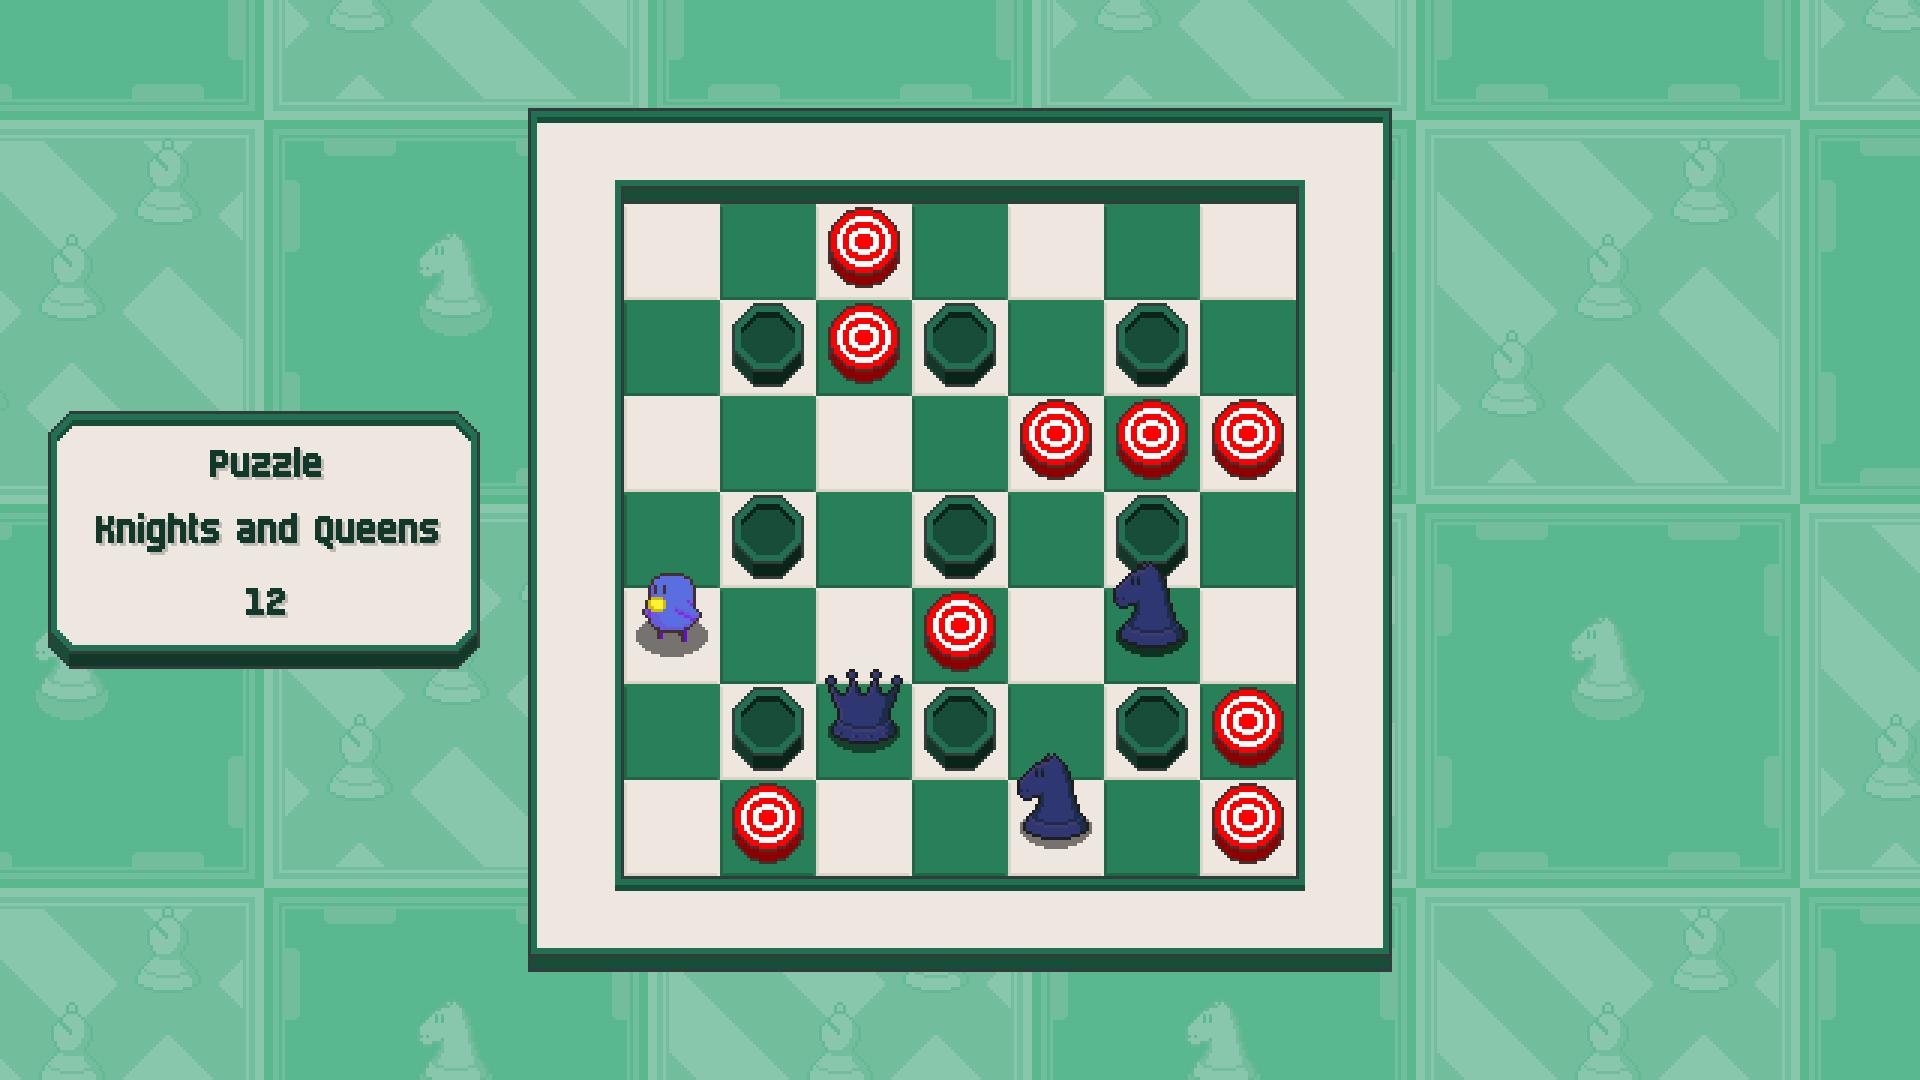 Chessplosion - Puzzle Solution Guide + Achievements Walkthrough - Grandblaster: Knights and Queens - FEFAA3B